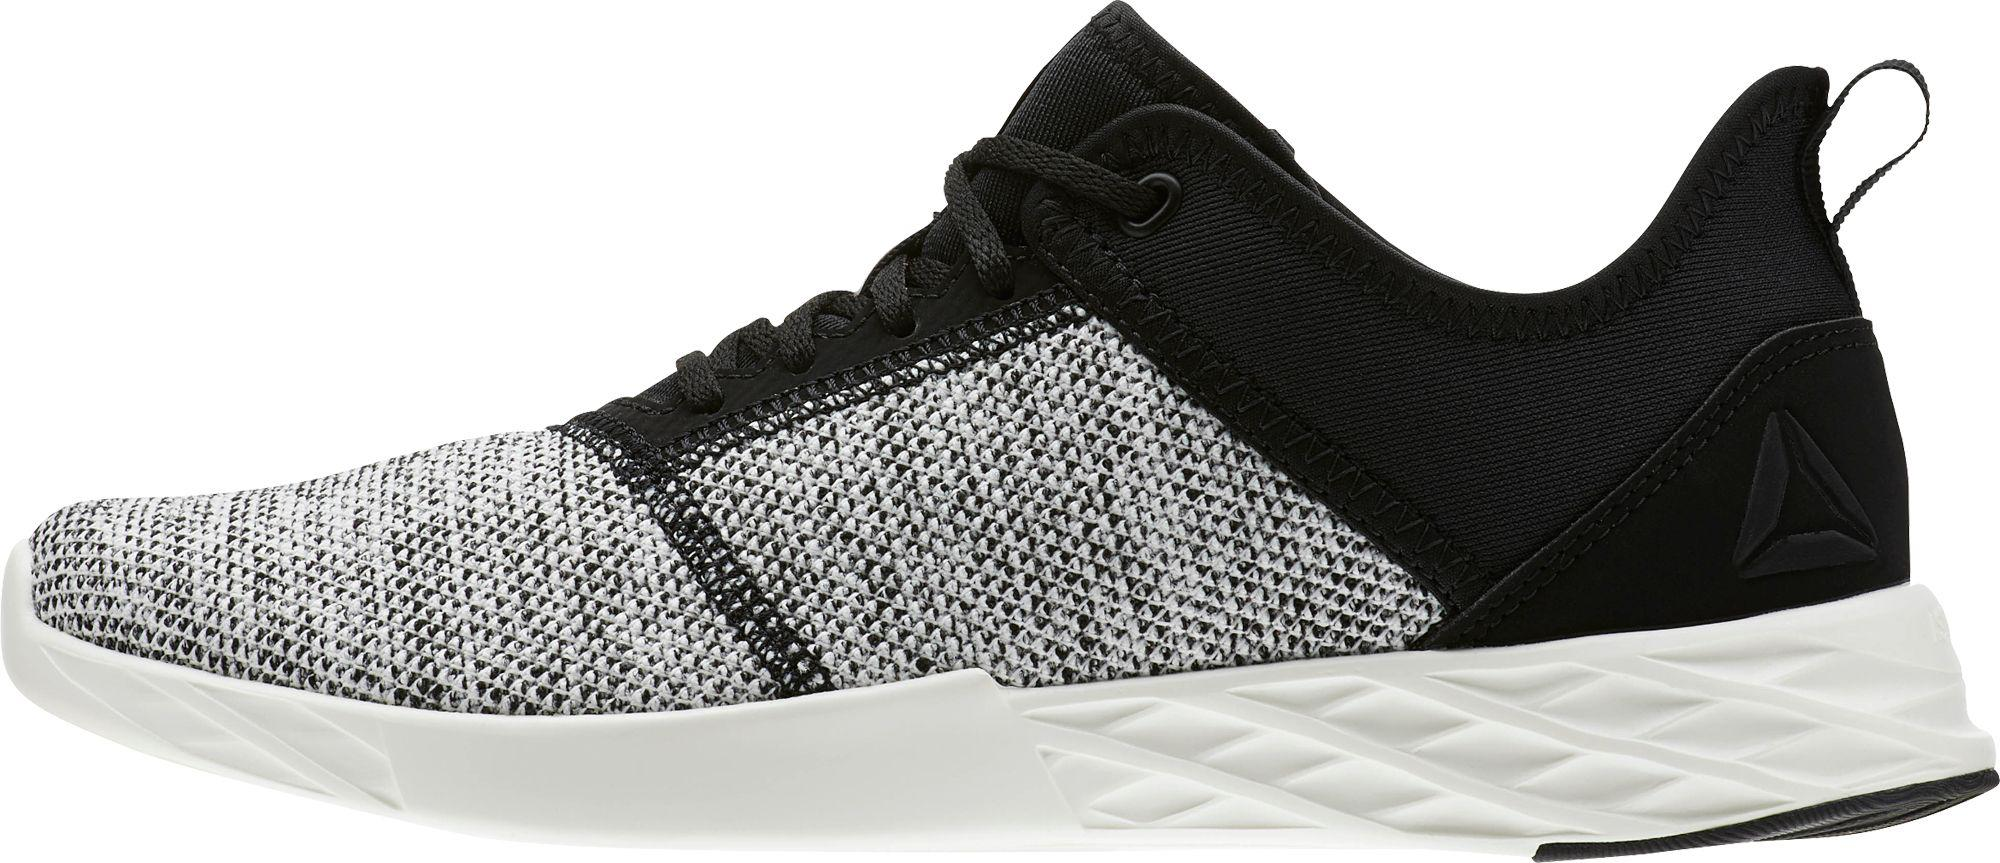 e292d5b2498c Lyst - Reebok Astroride Run Edge Running Shoes in Black